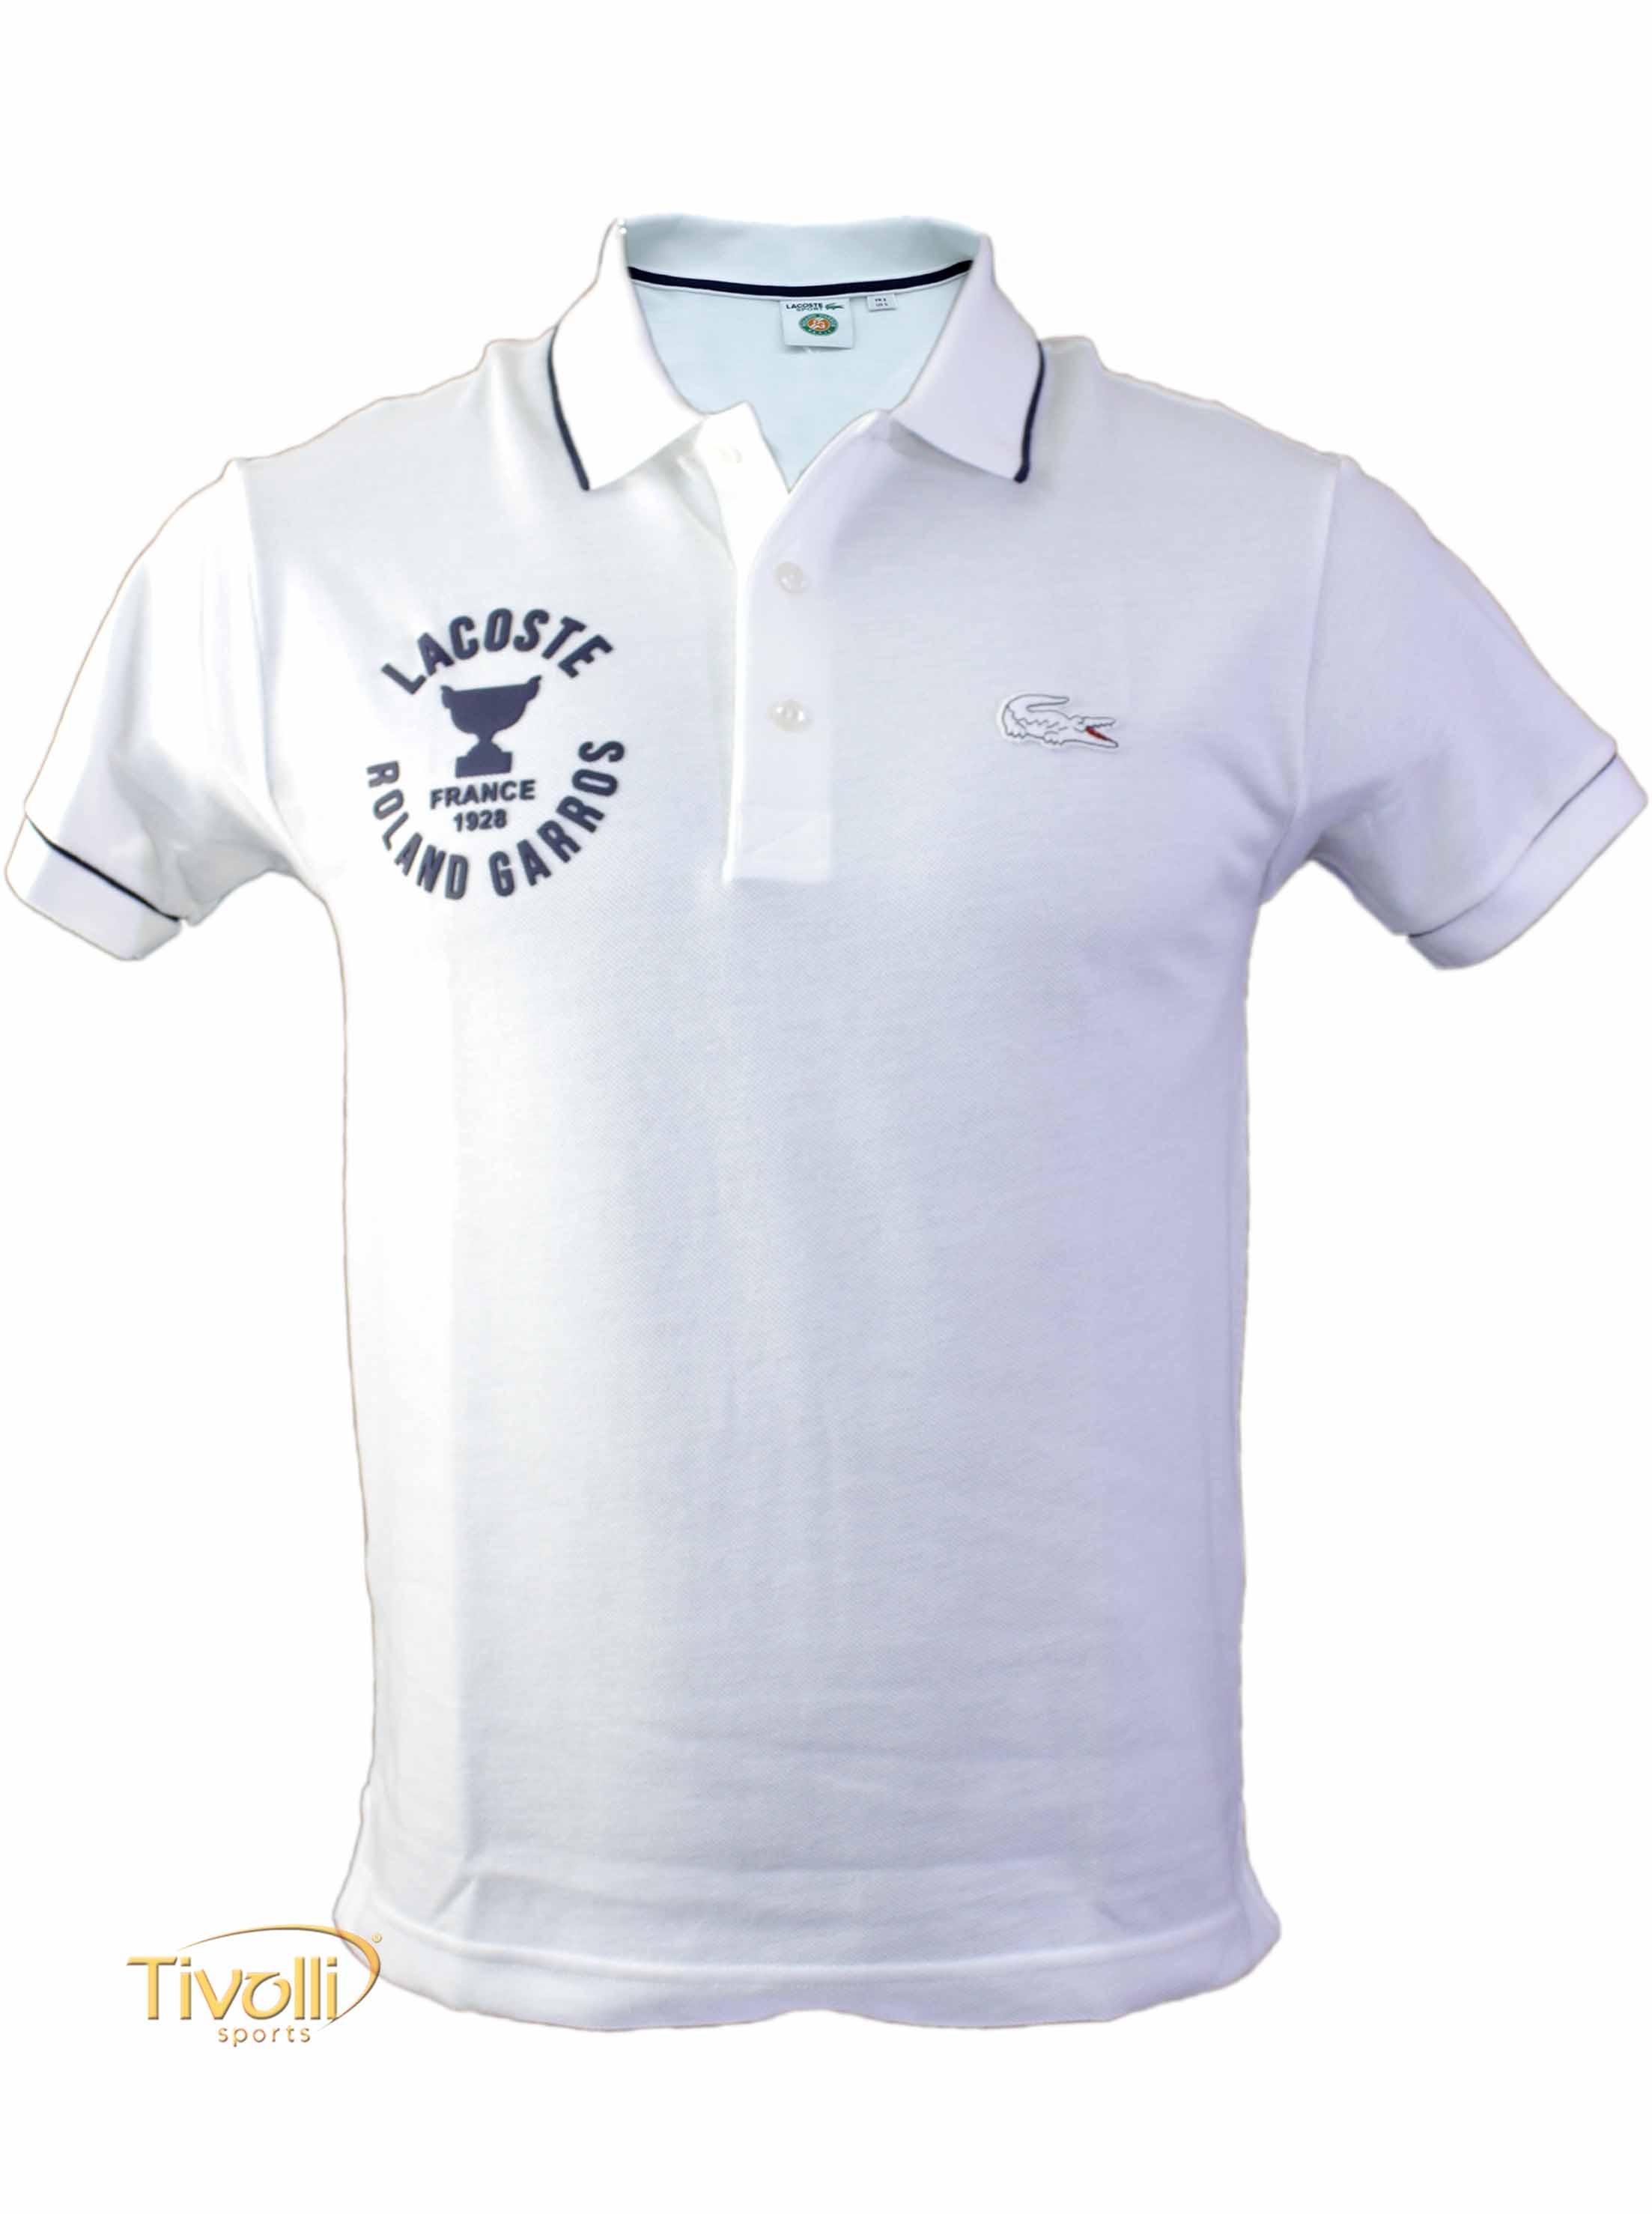 Raquete Mania   Camisa Polo Lacoste   Roland Garros Branca Estampada 94fb290c66511